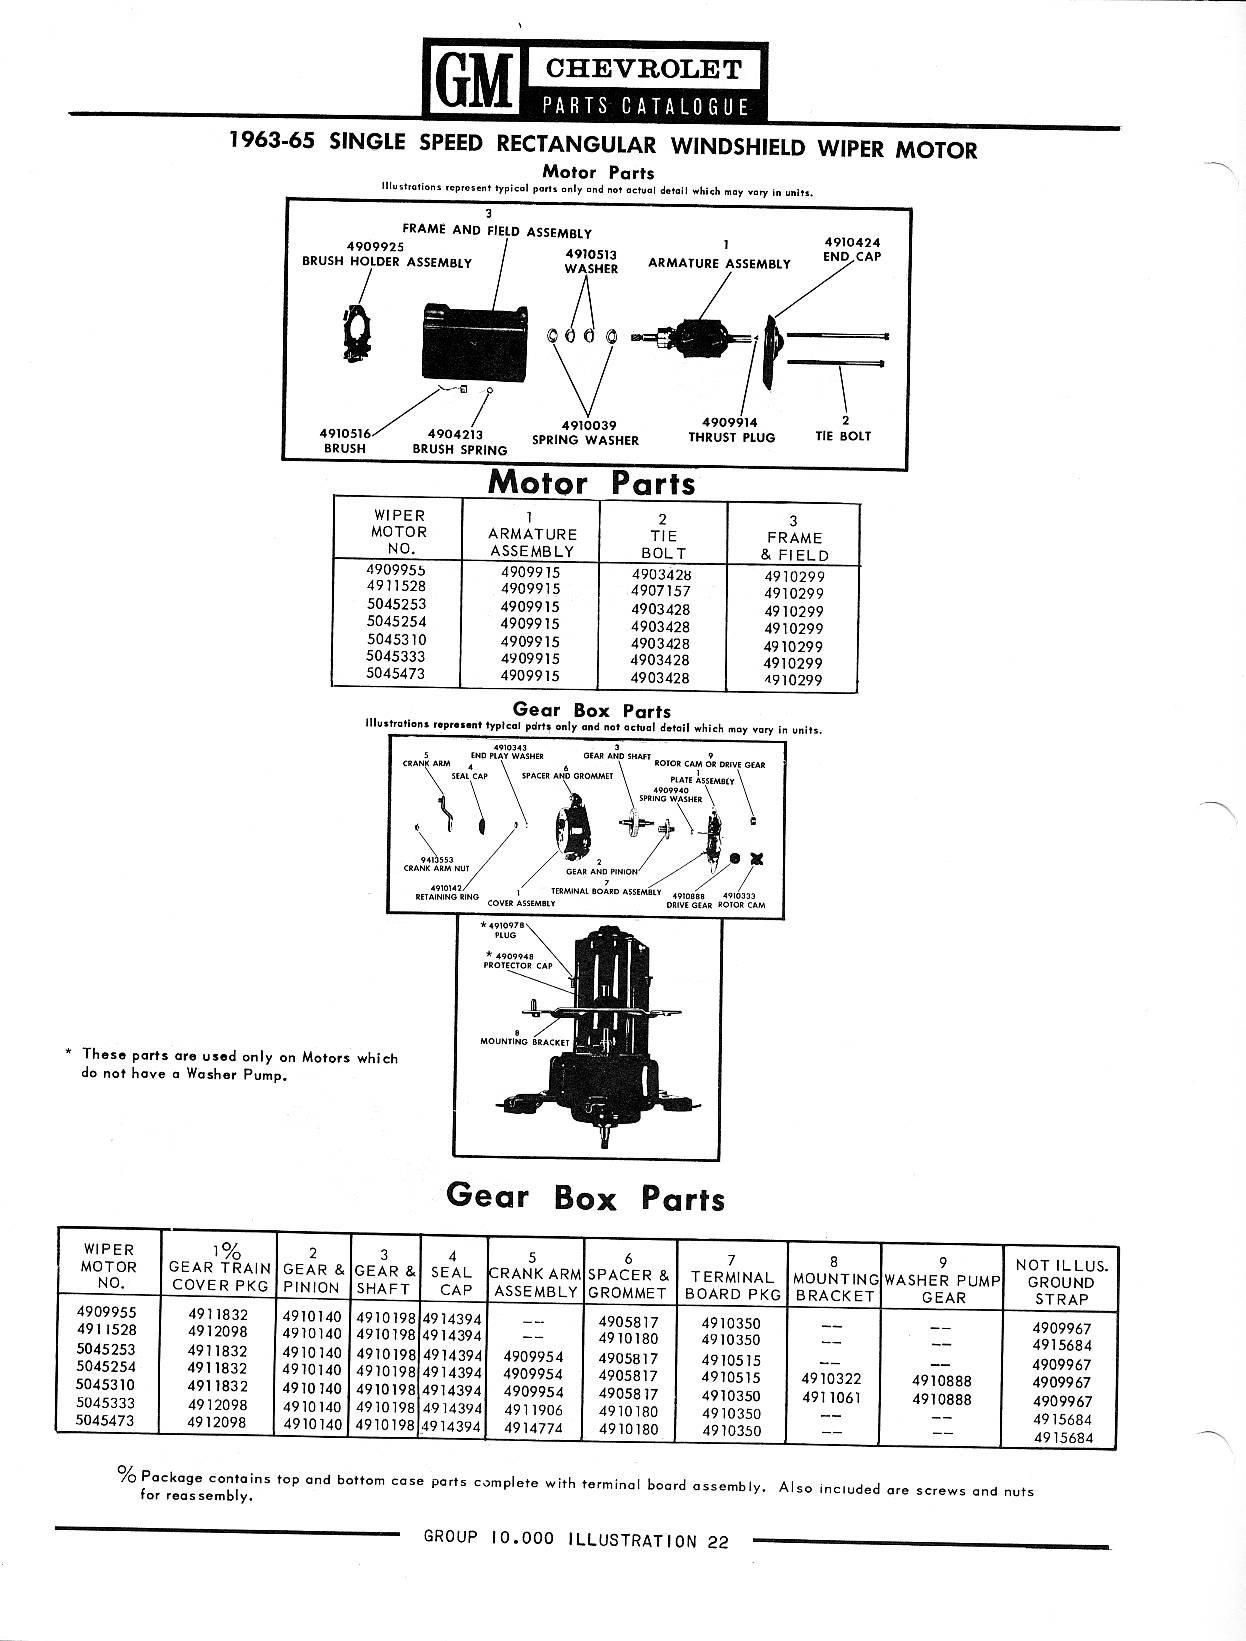 1958-1968 Chevrolet Parts Catalog / Image132.jpg